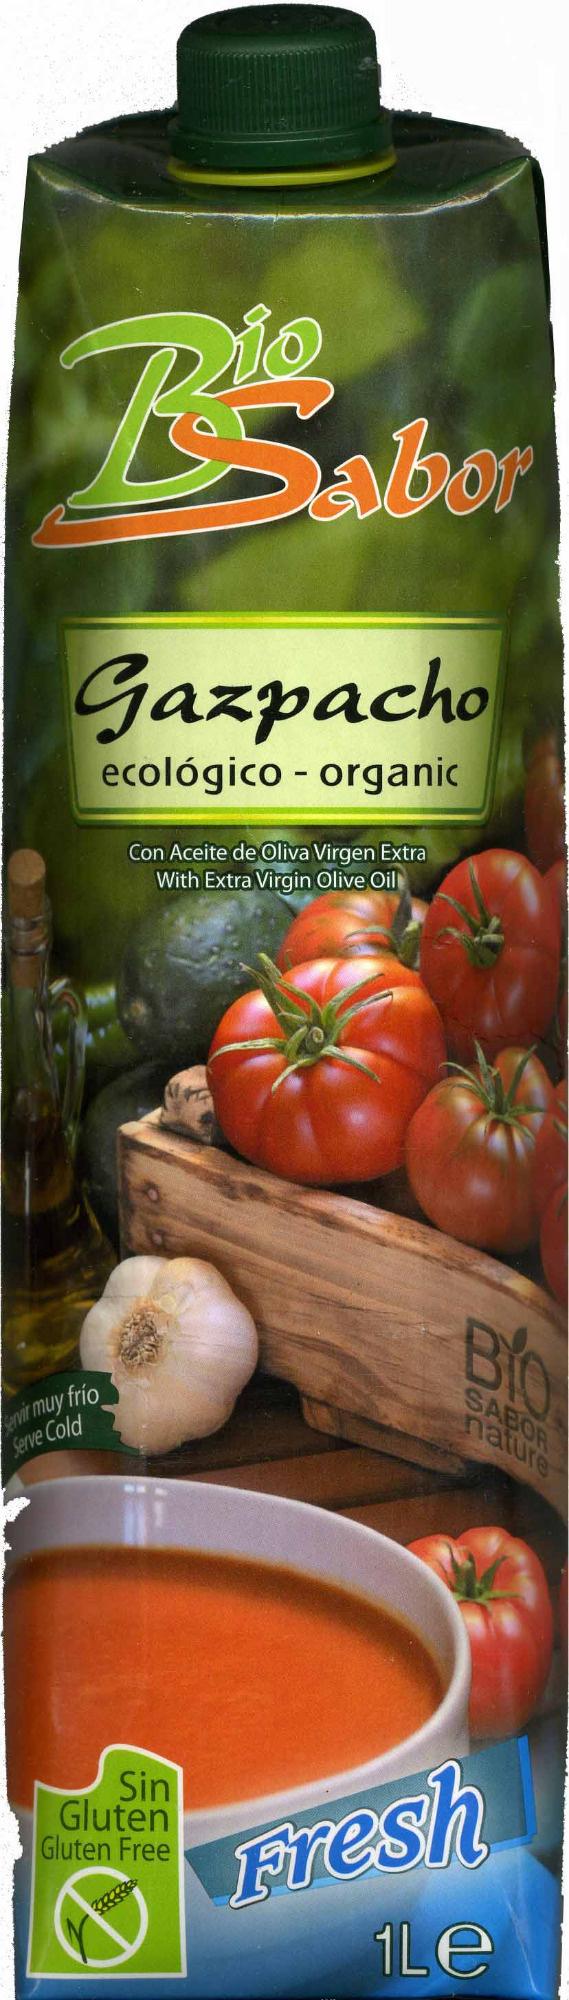 Gazpacho ecológico - Produit